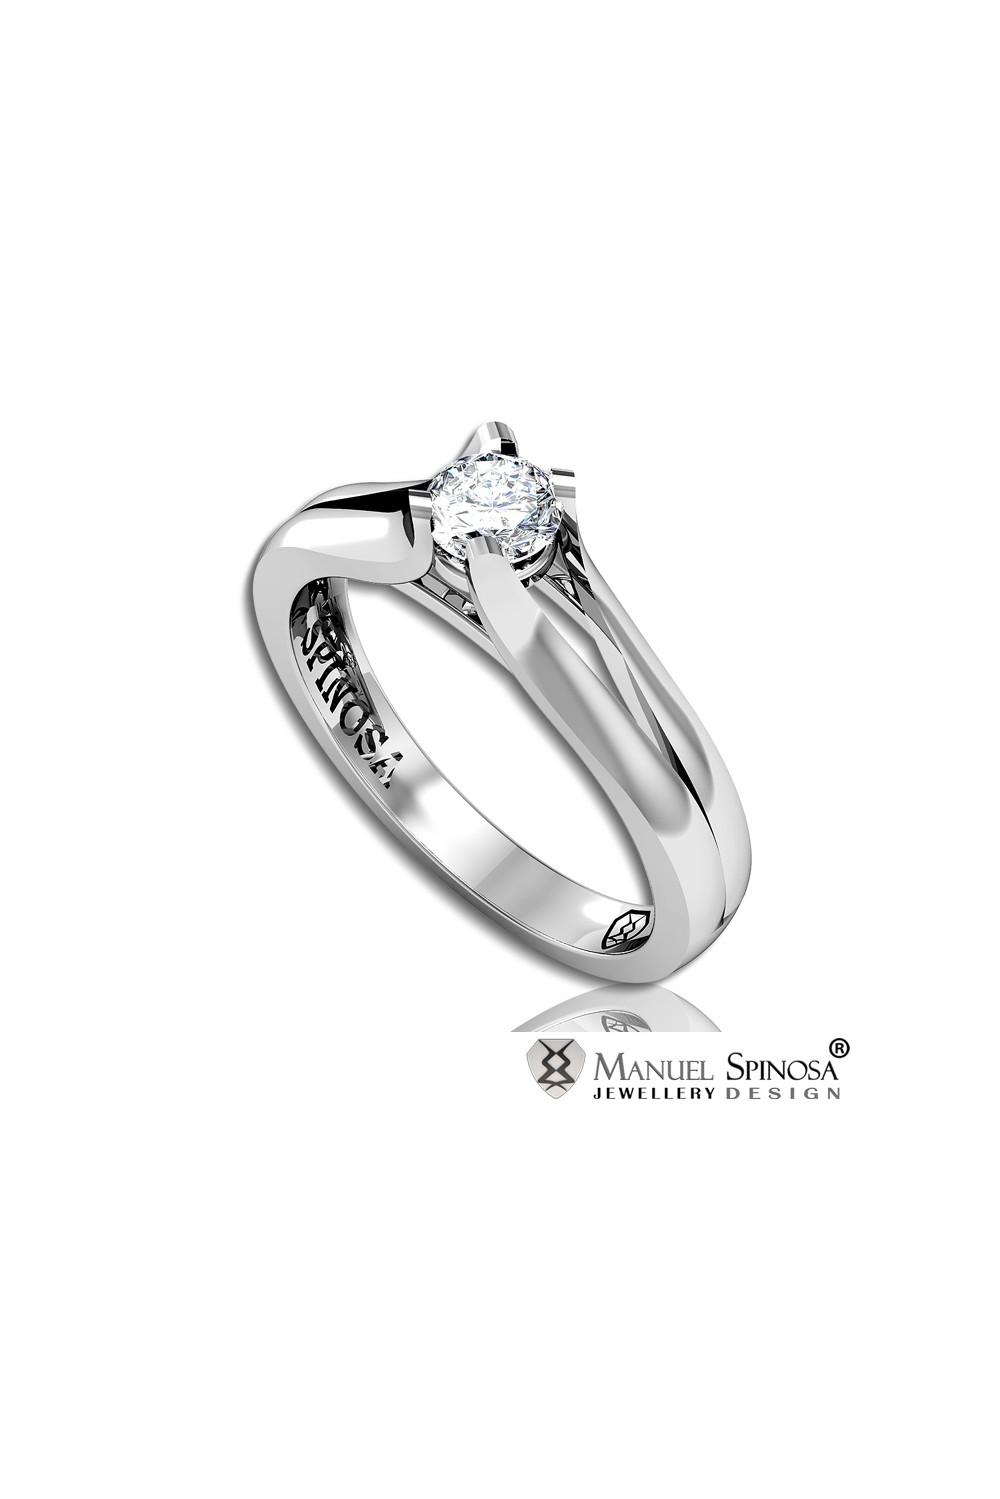 Multi modern diamonds engagement rings in Málaga Marbella